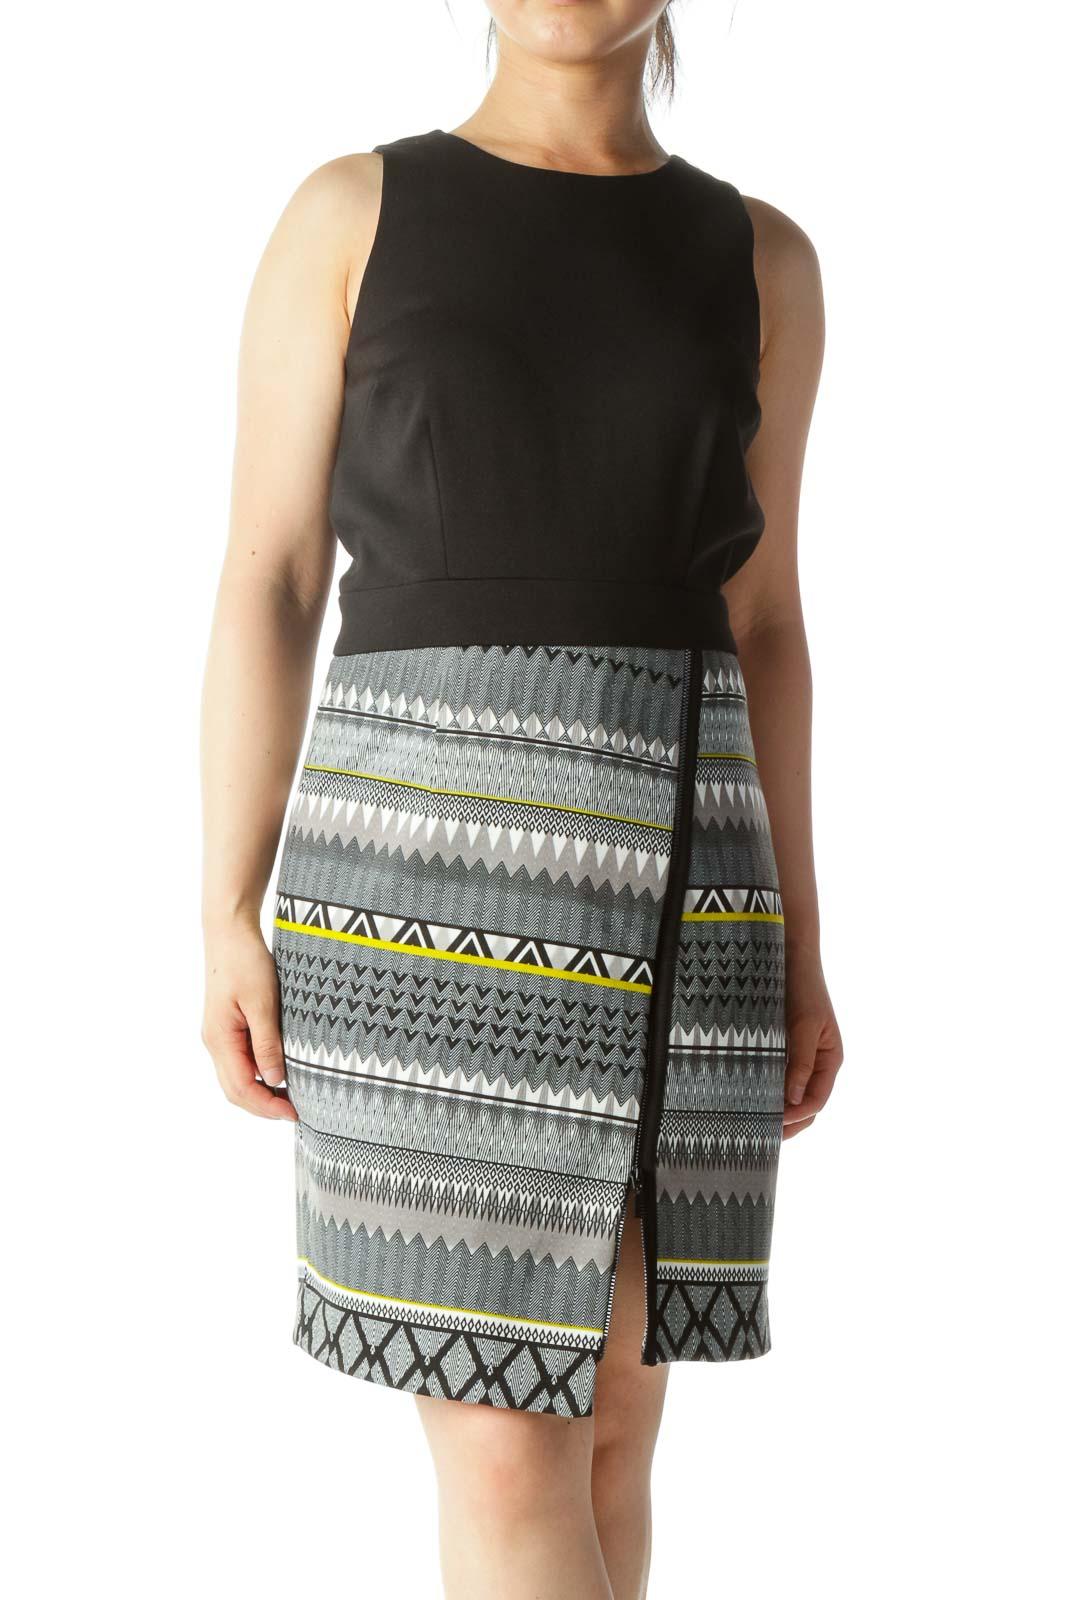 Black White Gray Yellow Skirt Print Zipper Accent Dress Front